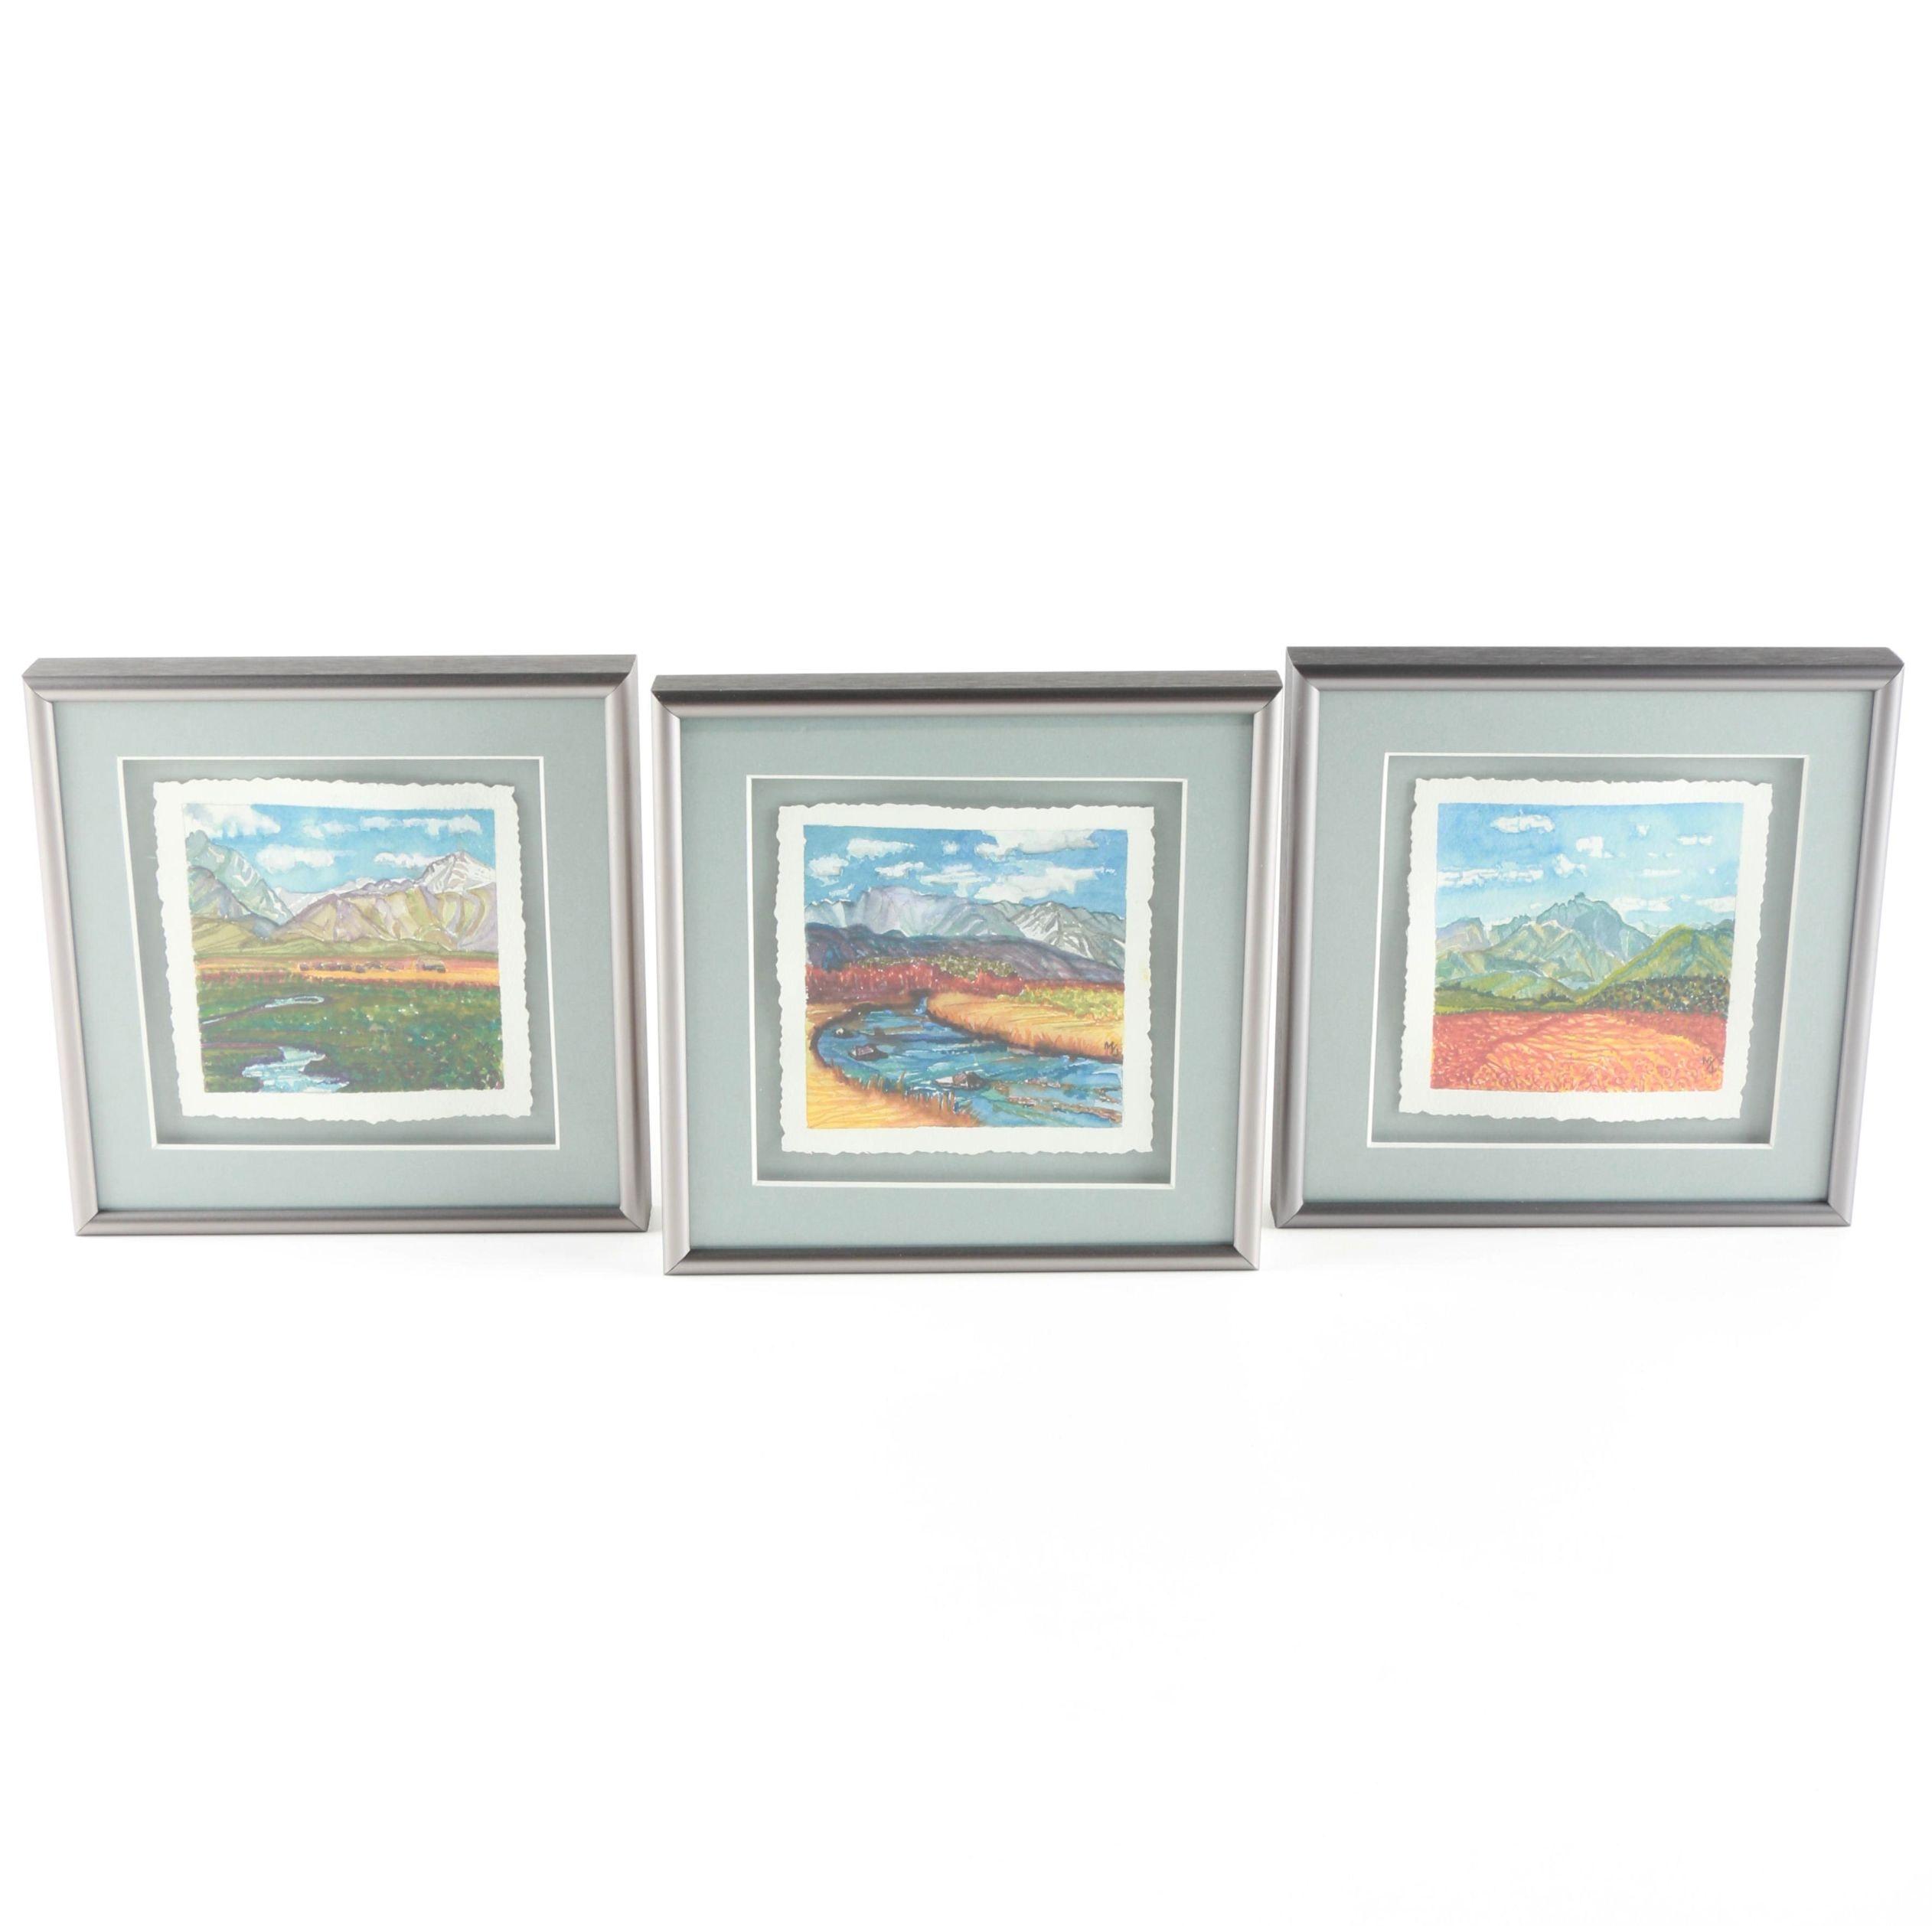 Watercolor Landscape Paintings on Rag Paper